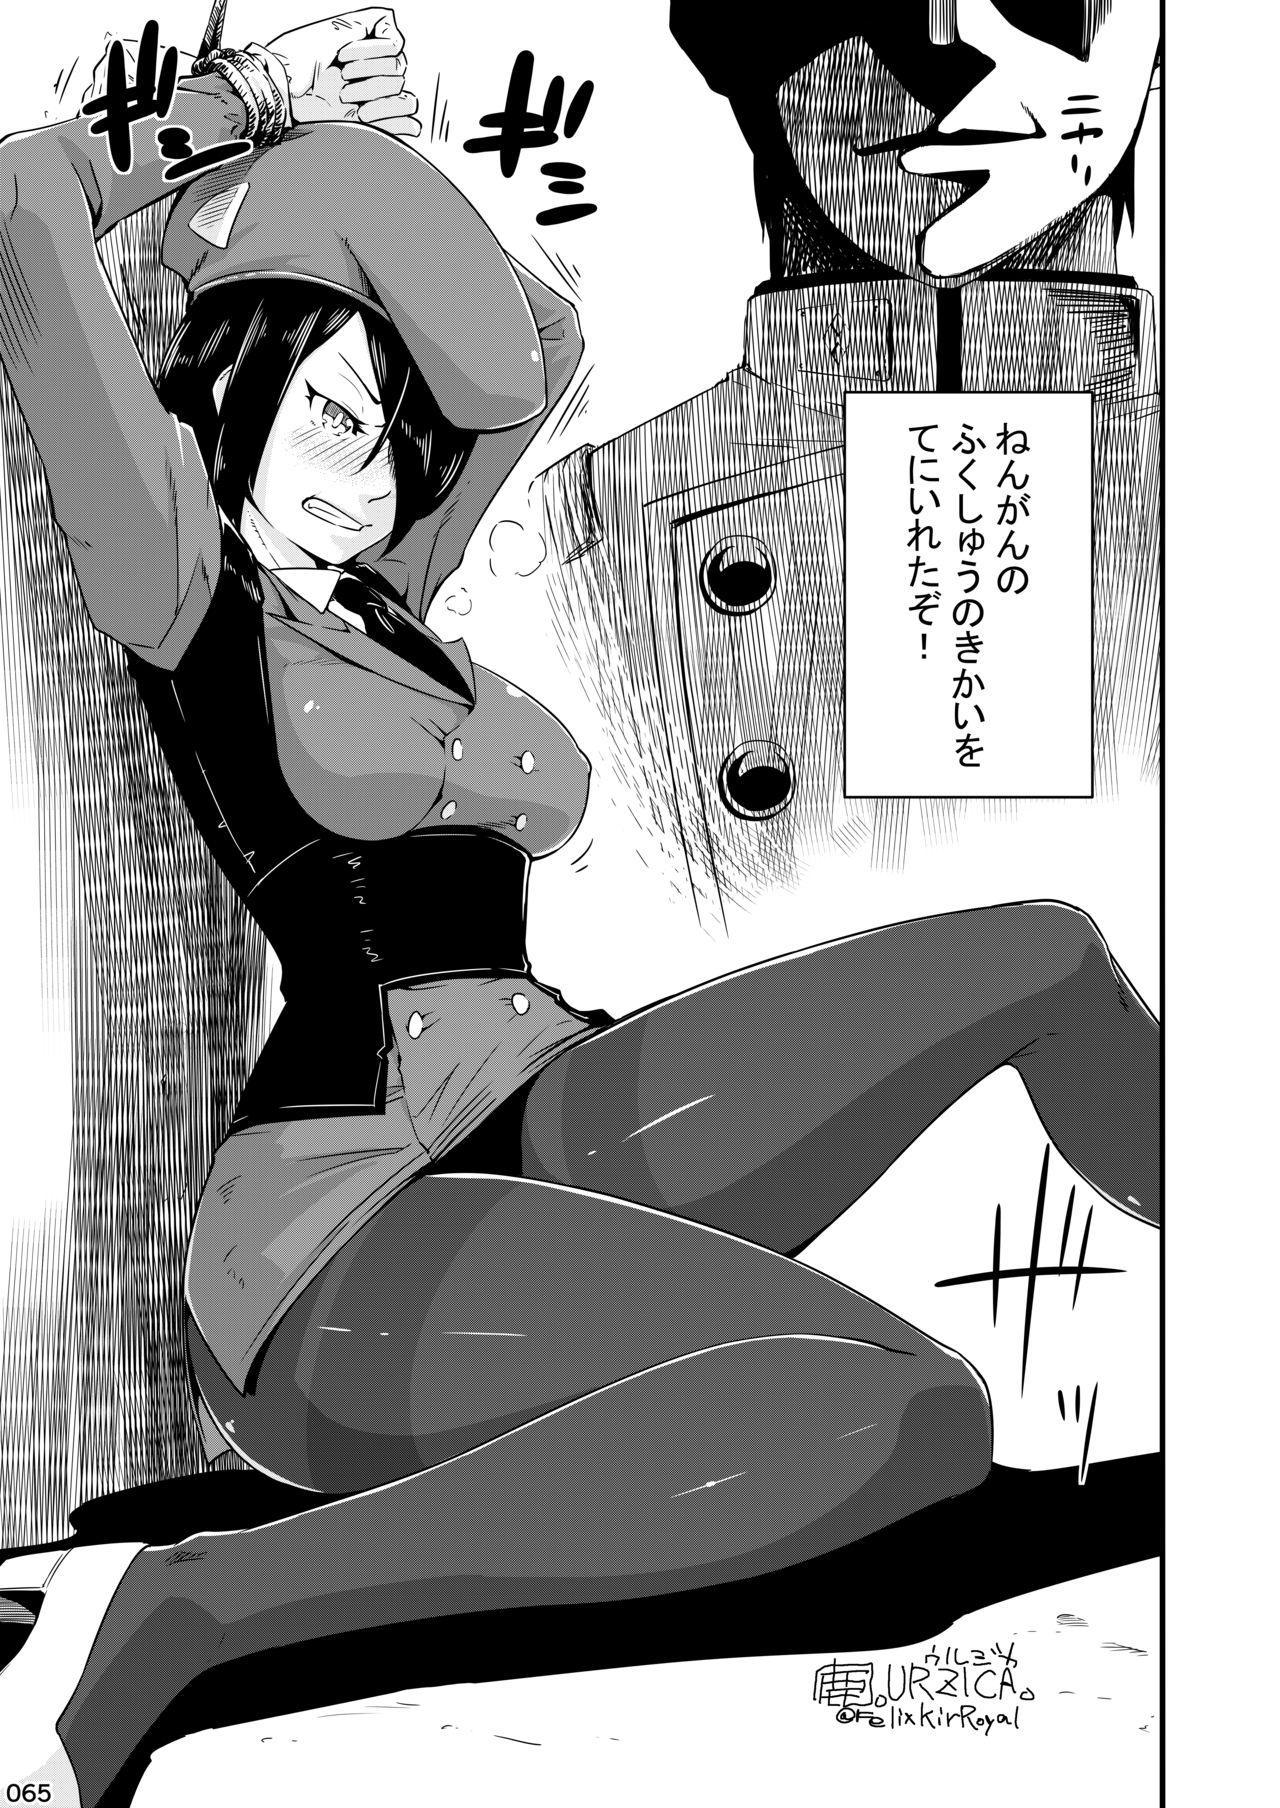 Akatsuki Blitzkampf & EN-1 Perfekt Welt Gangbang Anthology 64